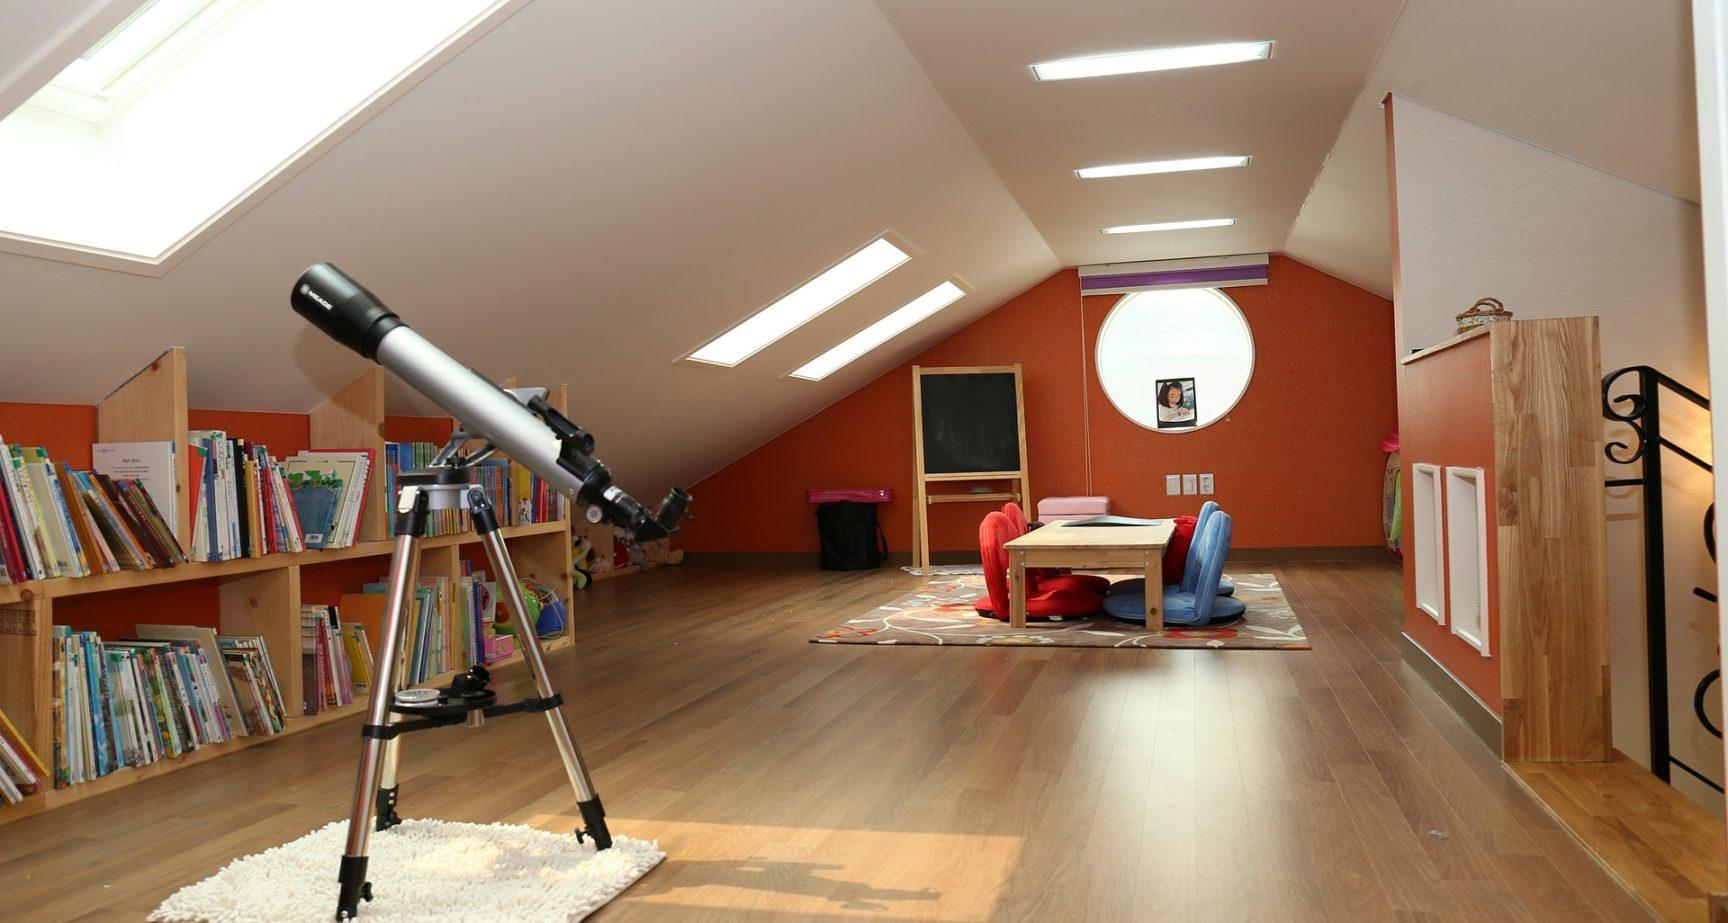 Förbättra husets funktionalitet med en vind